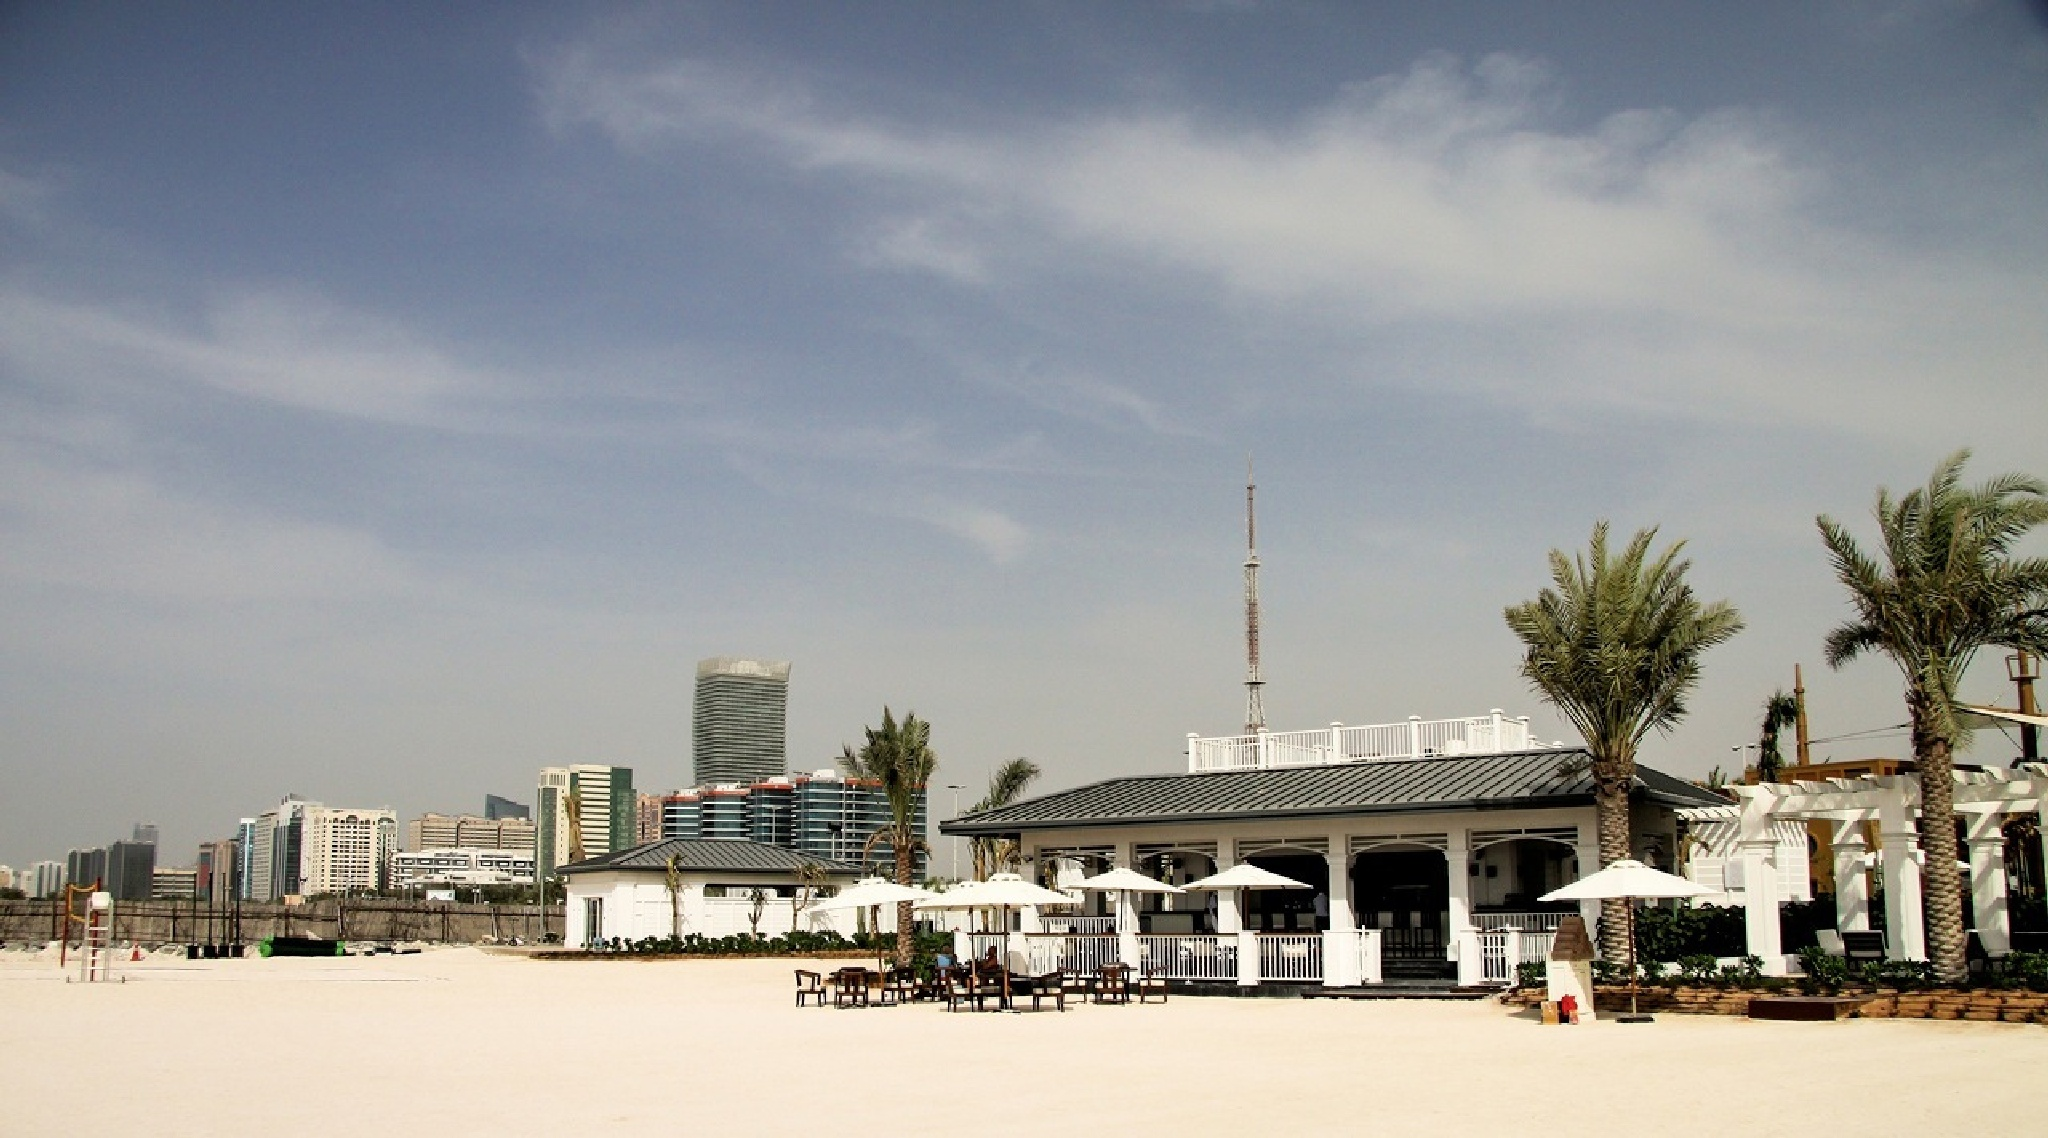 Abu Dhabi beach by charles1962